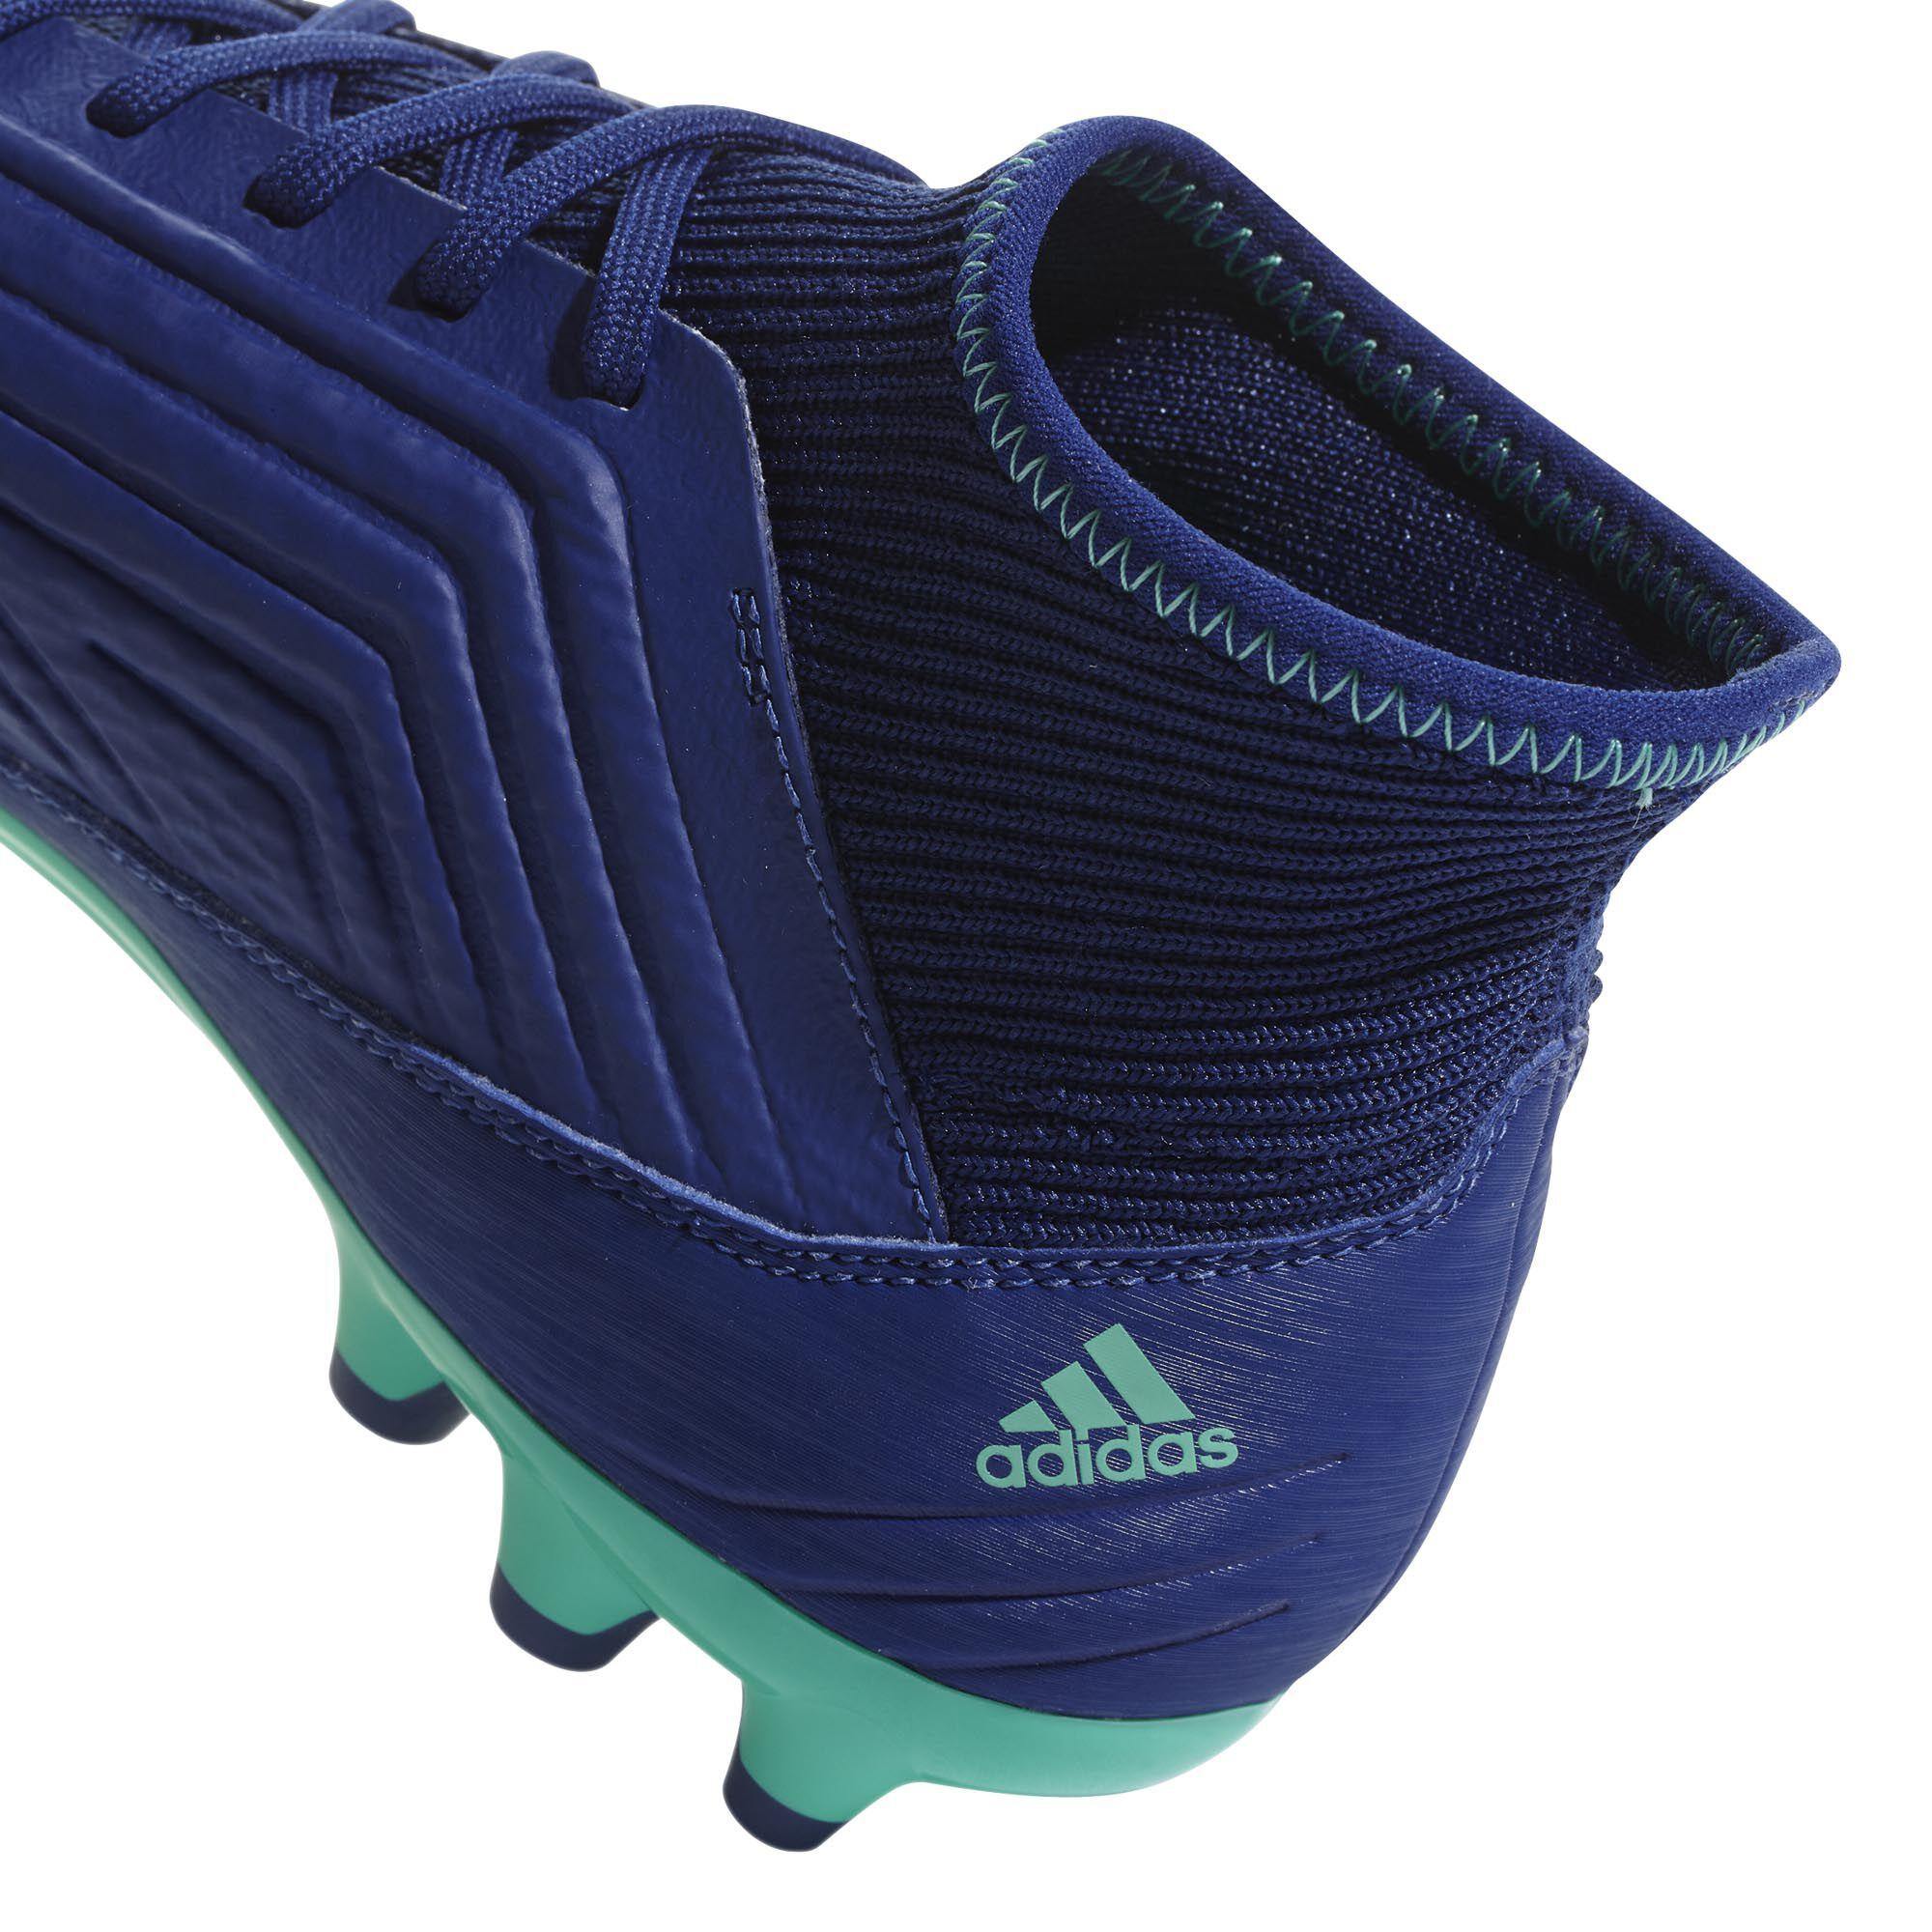 quality design 5b2b4 965b8 Fútbol Predator Botas 18 Ag Adidas 3 g0Yxzwn